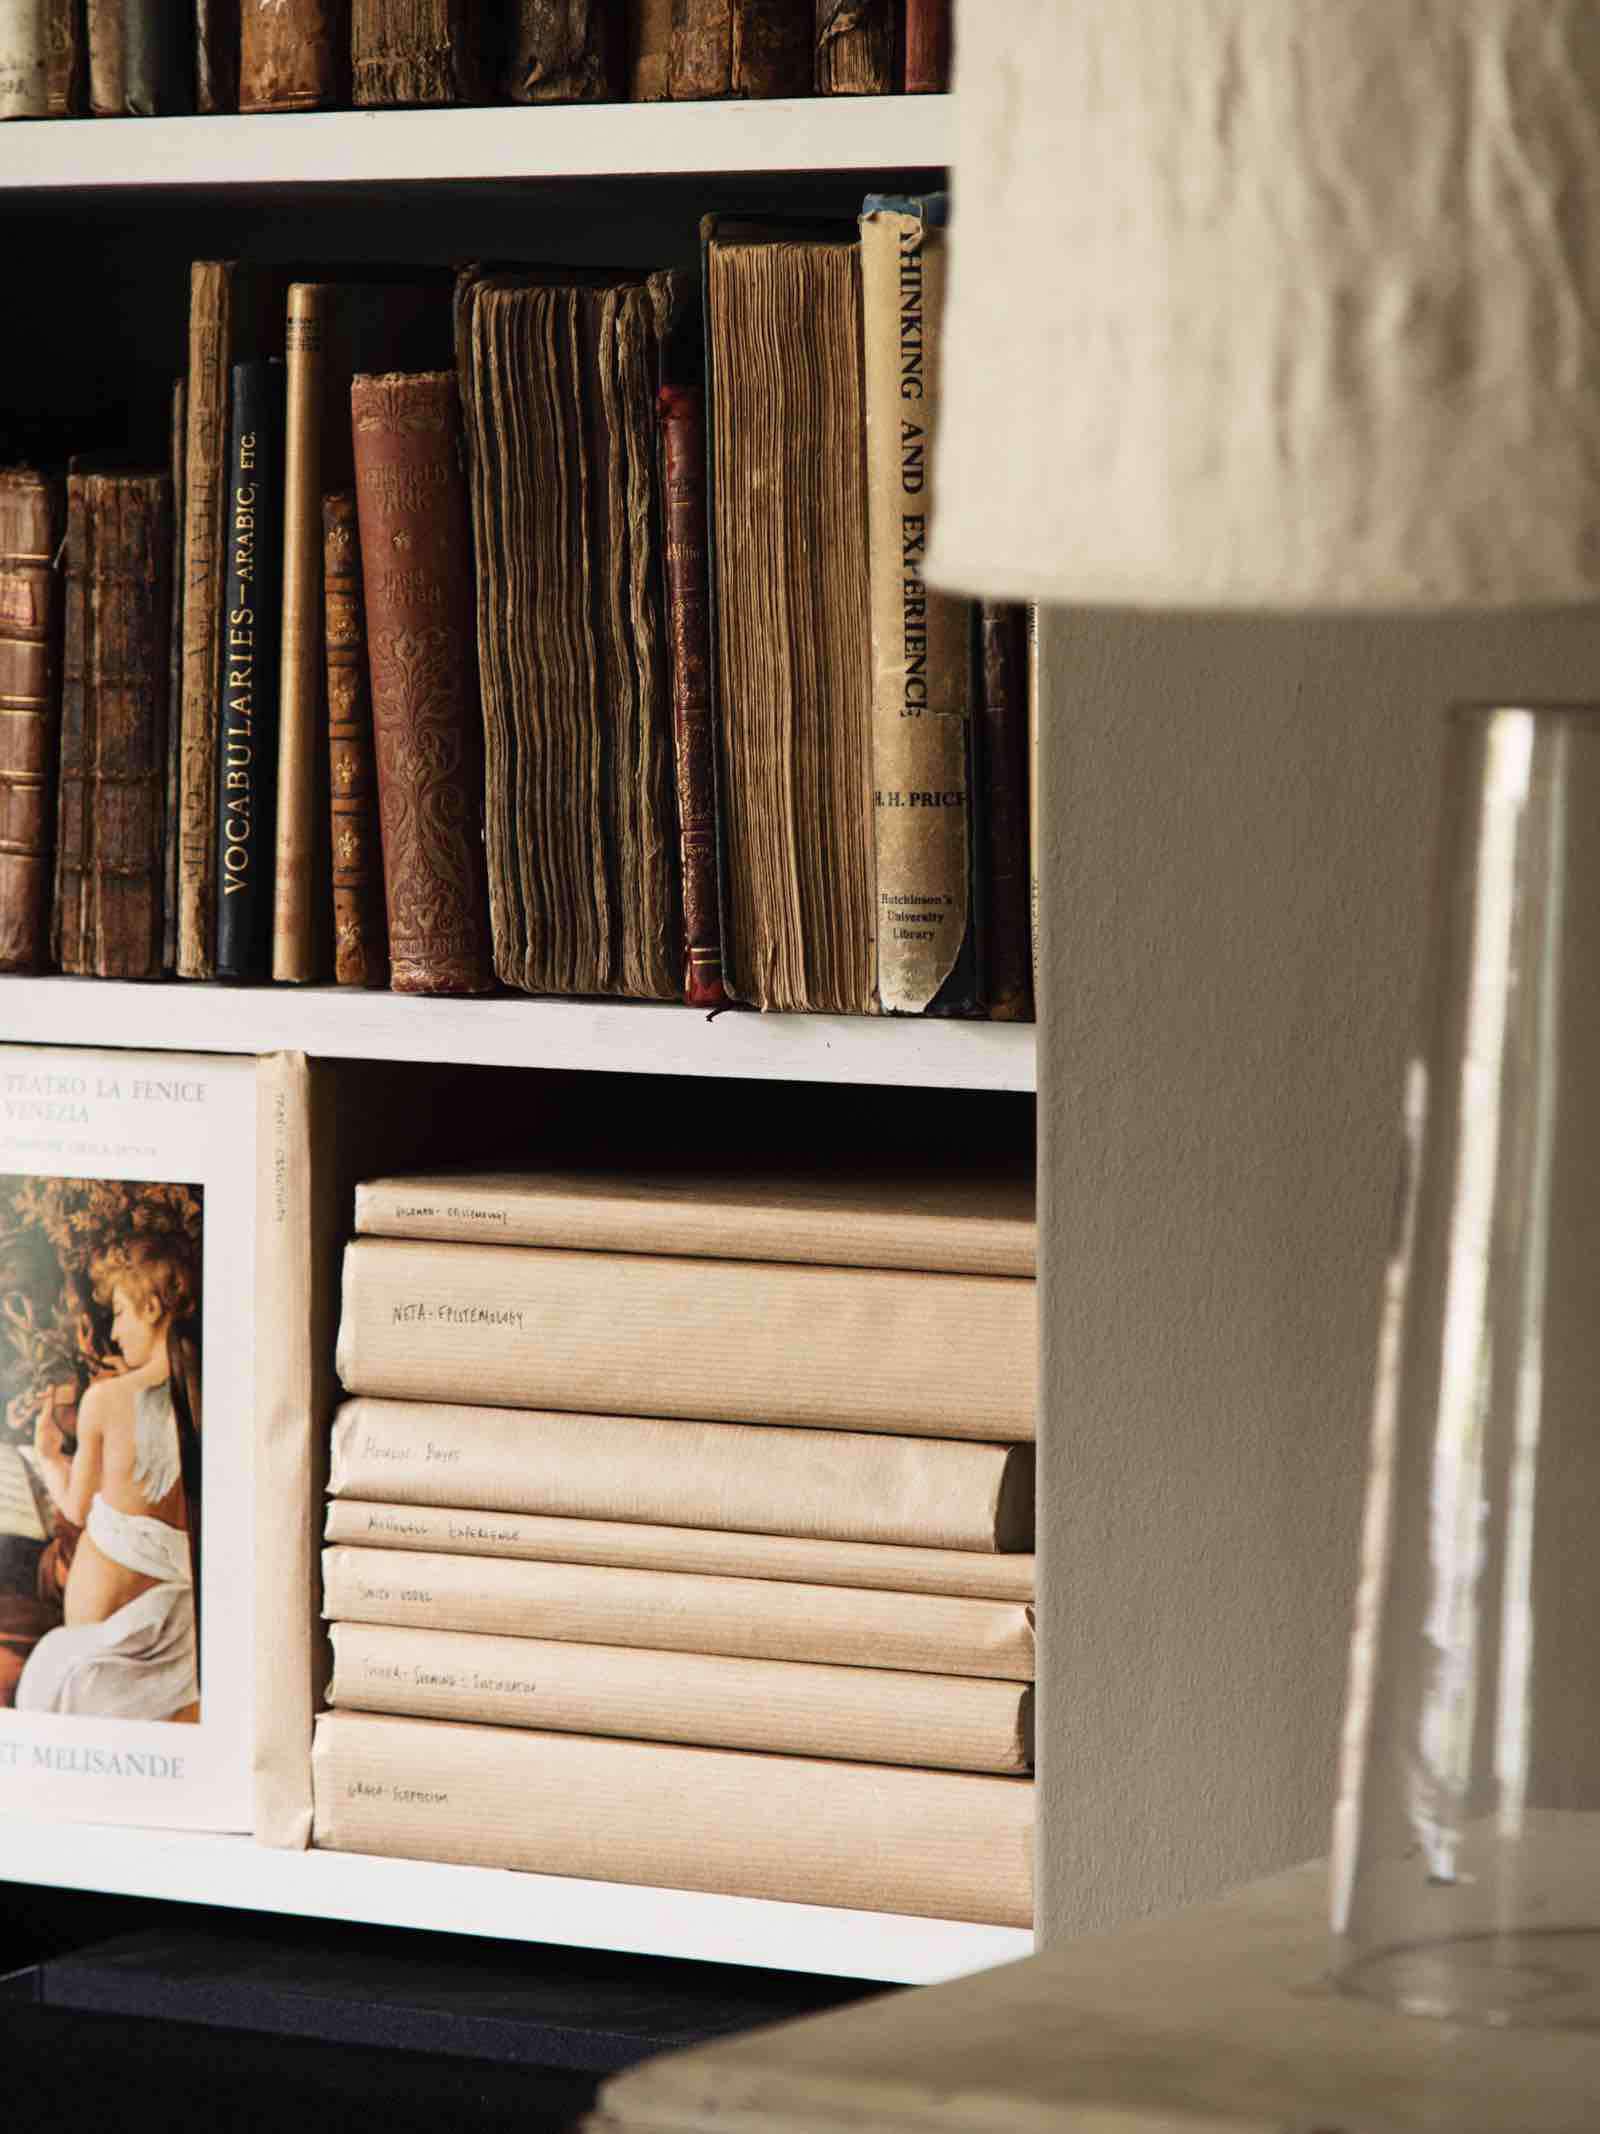 kraft paper covered books